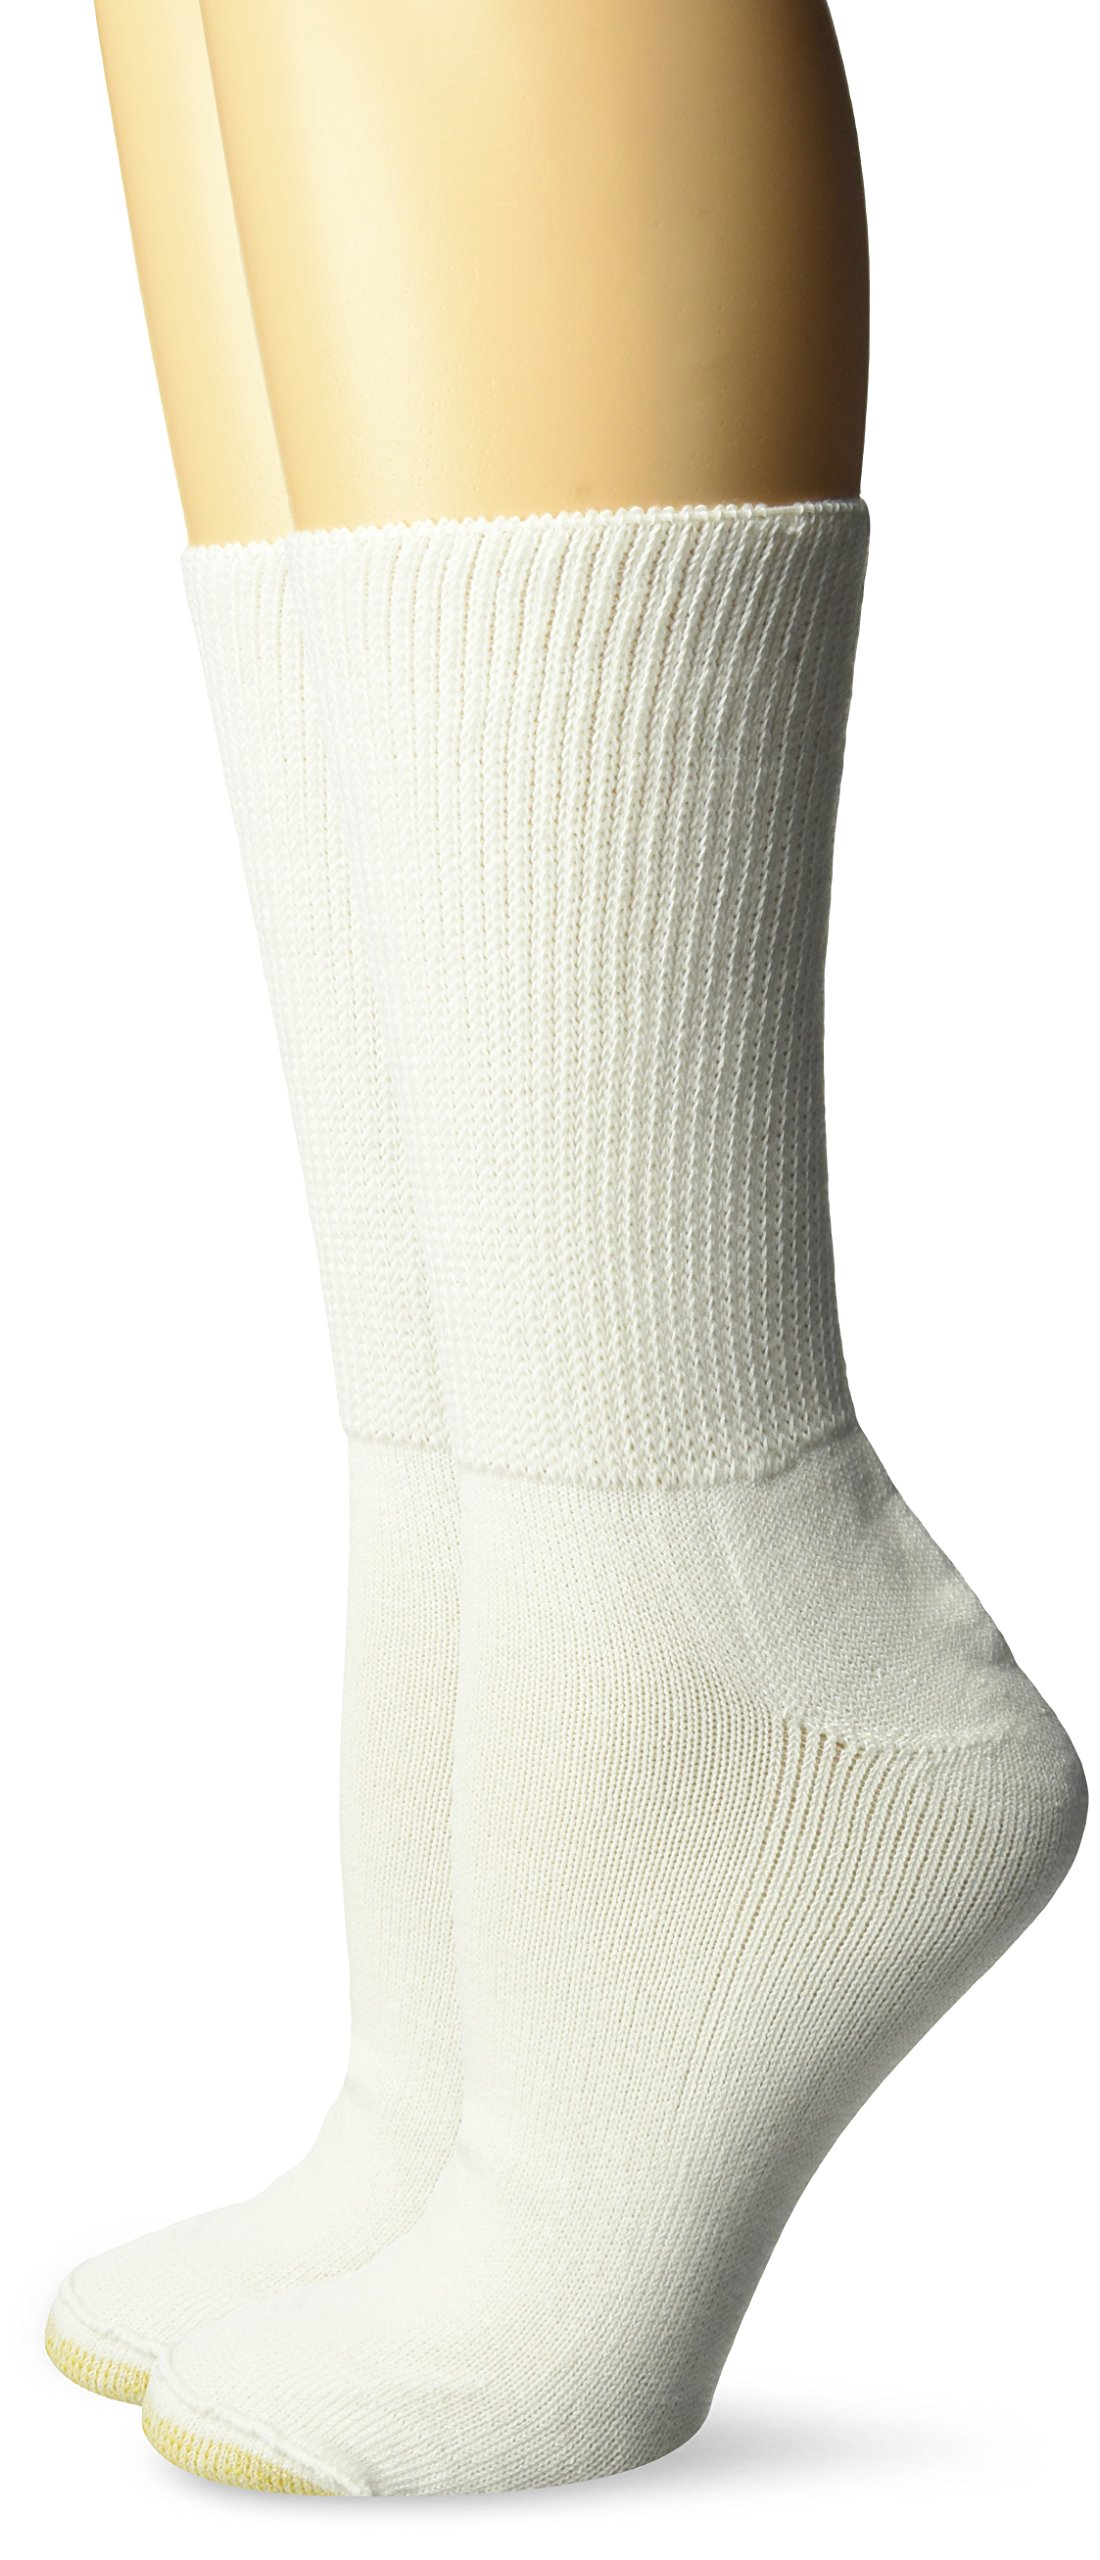 Gold Toe Women's Super Soft Non-Binding Crew Socks, 2 Pairs, White, Shoe Size: 6-9